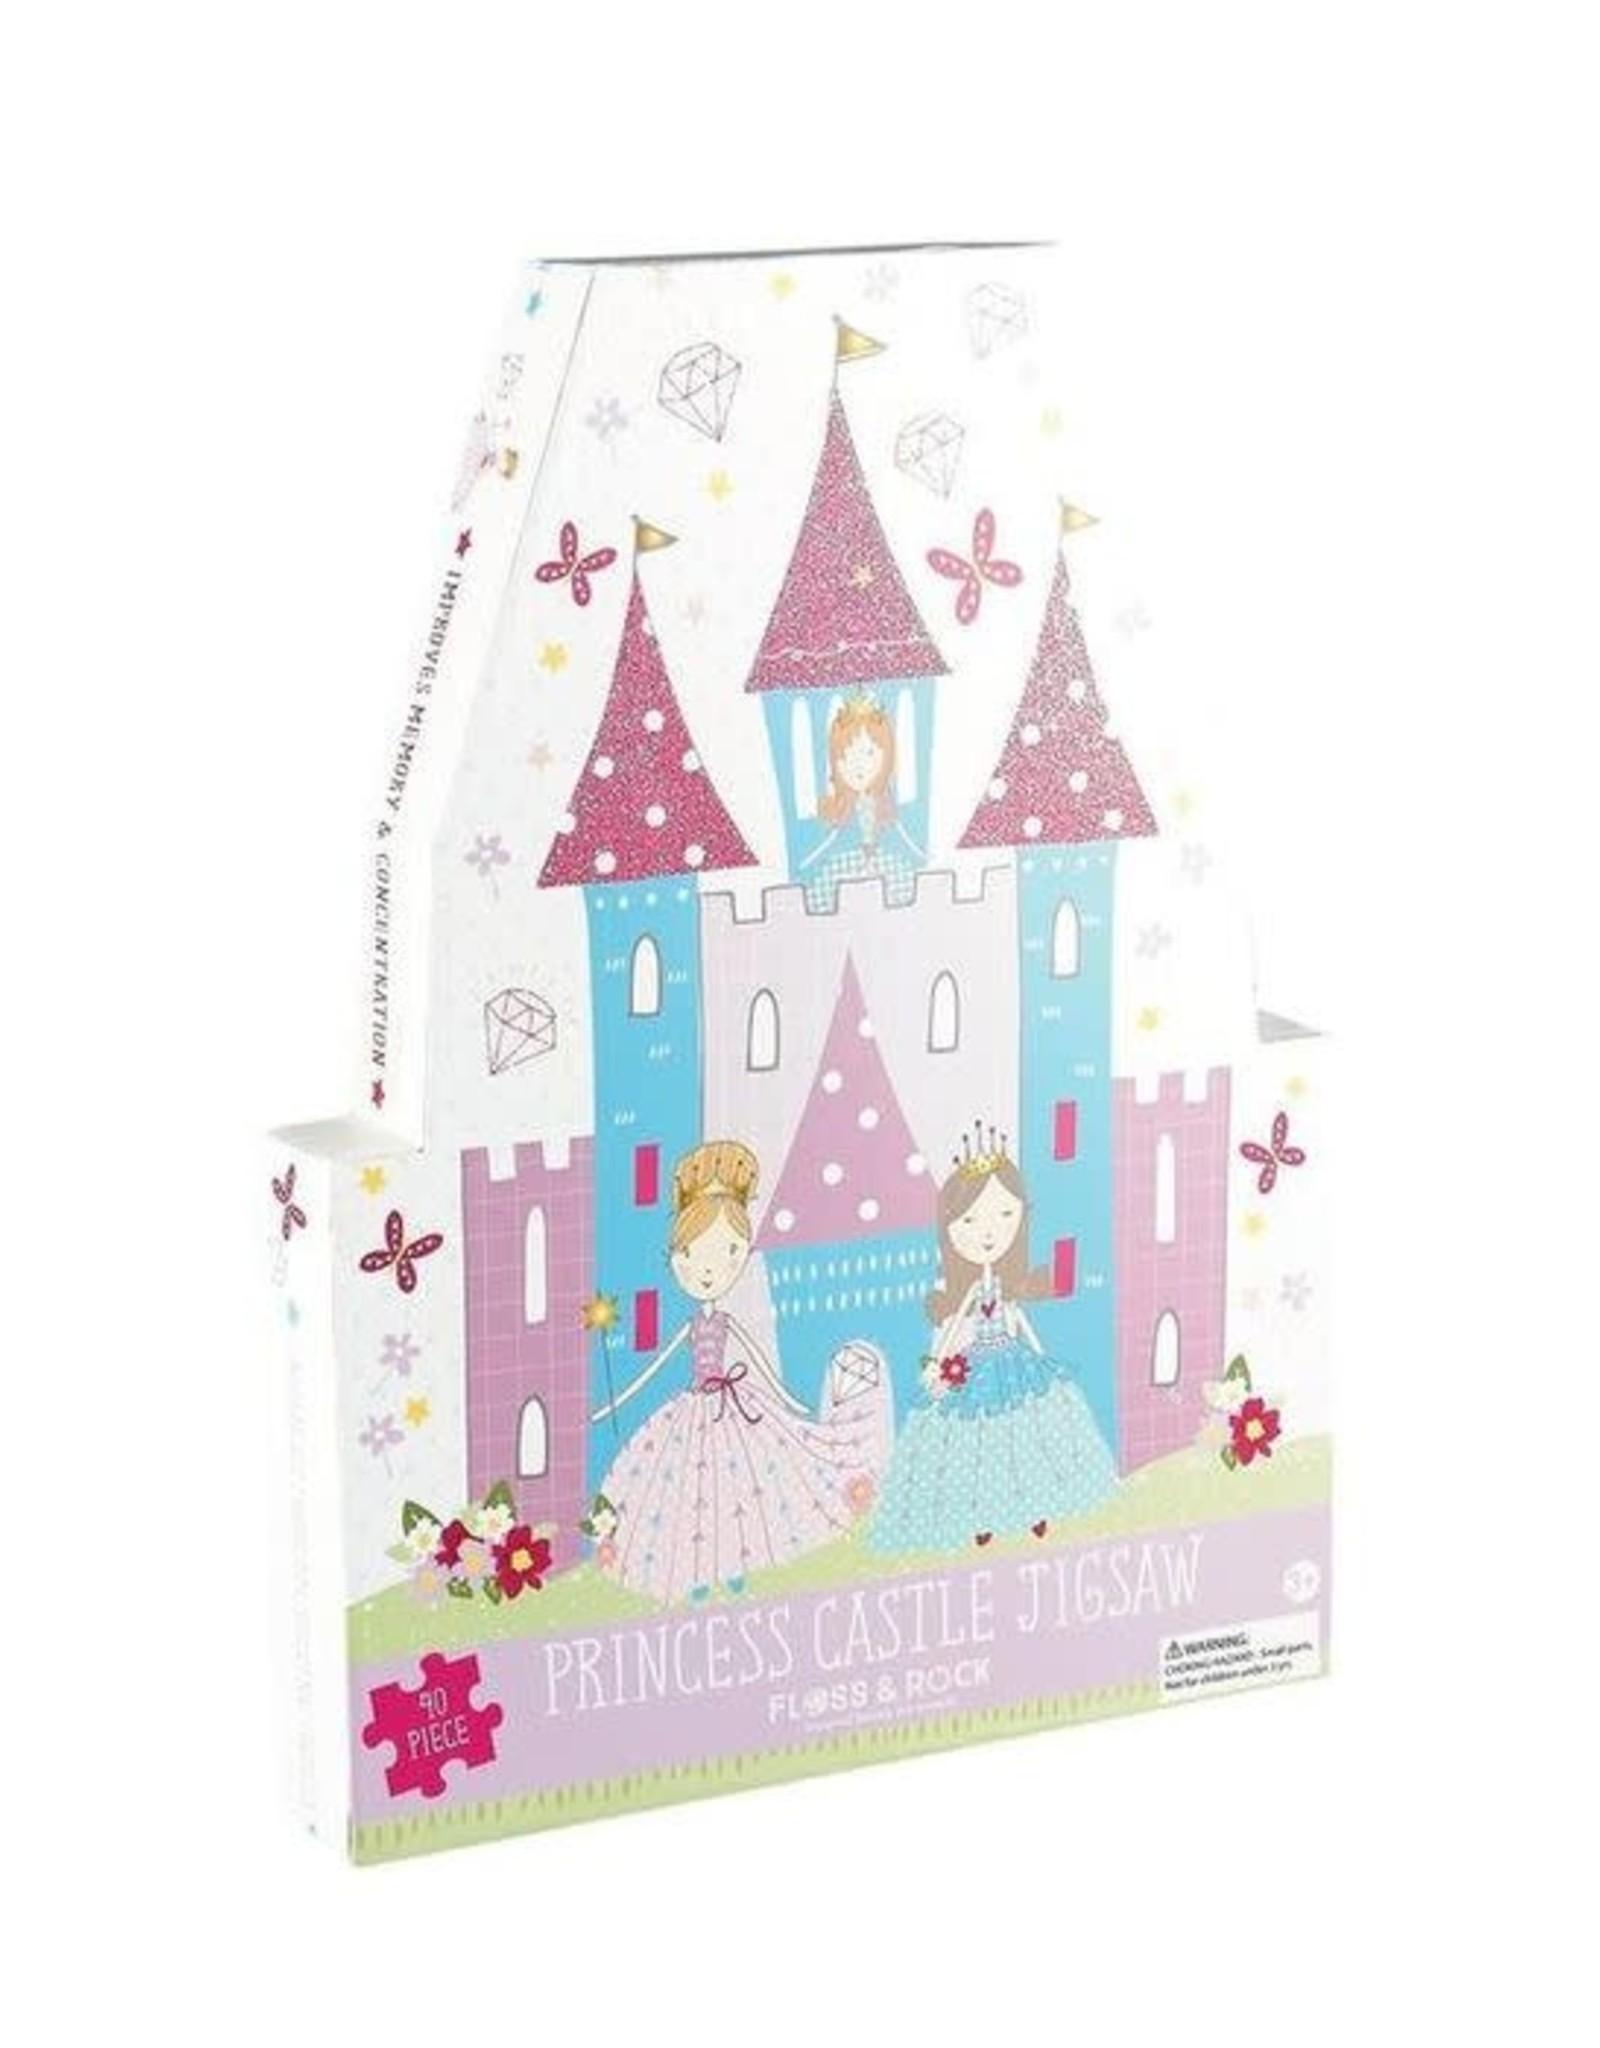 Floss & Rock Floss & Rock Princess Castle Jigsaw Puzzle